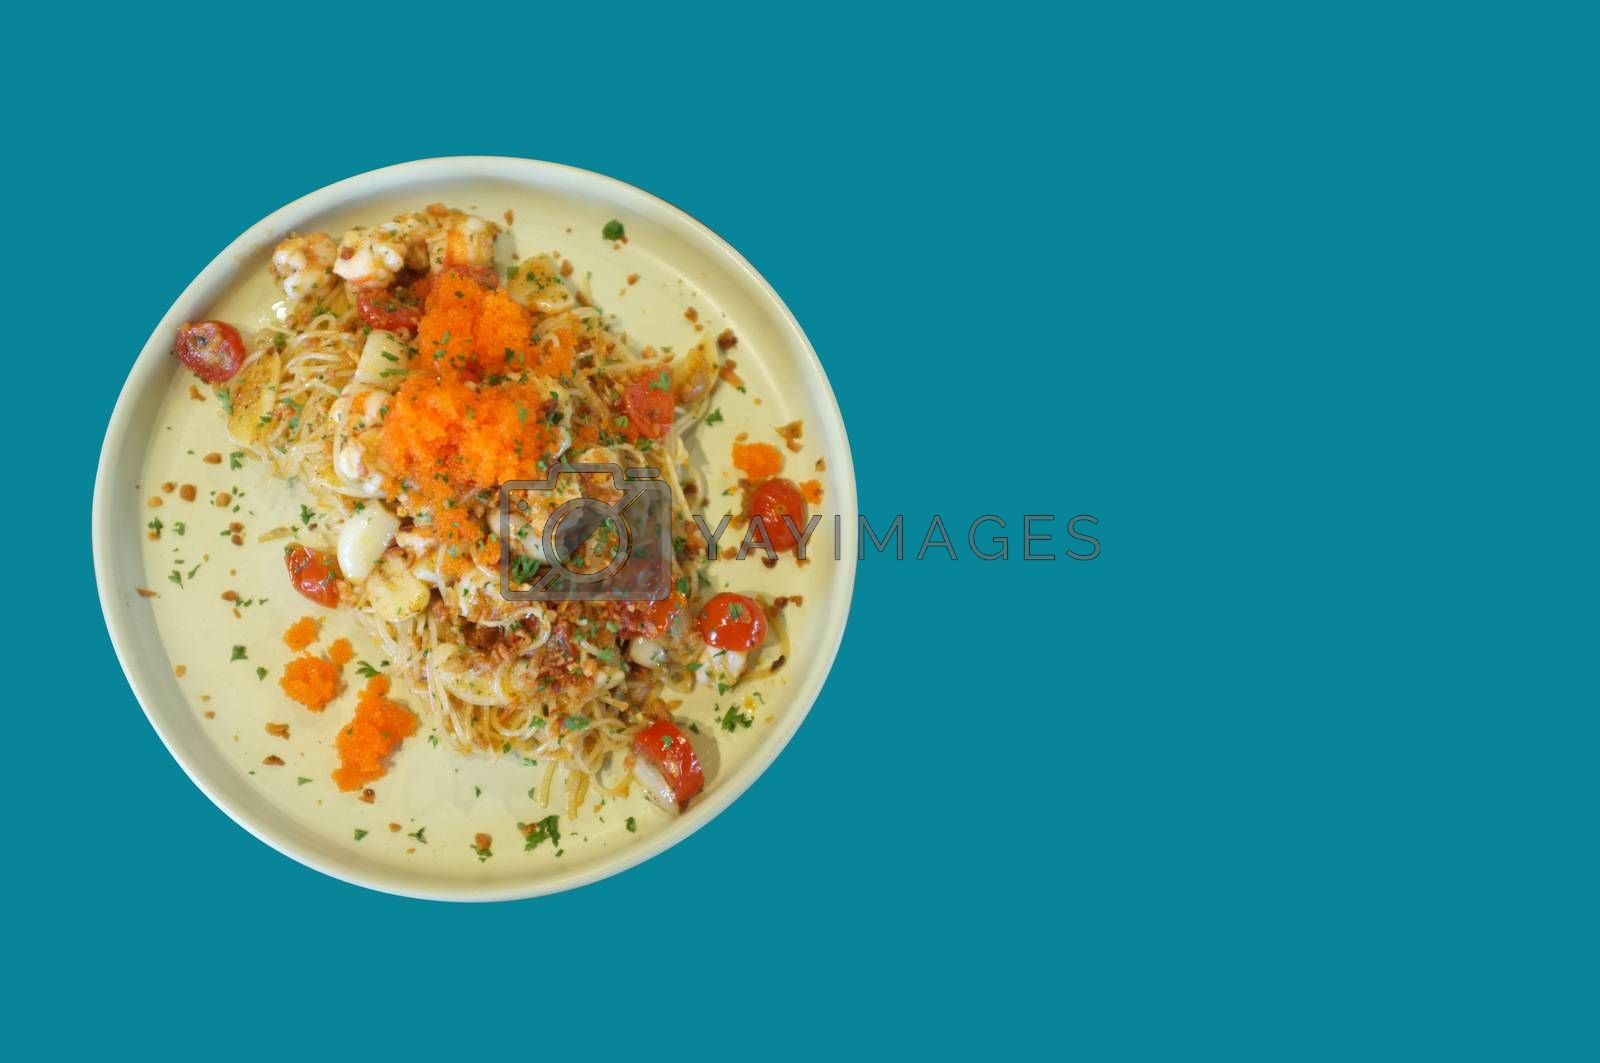 fusion food style , Cream sauce spaghetti egg shrimp on blue background